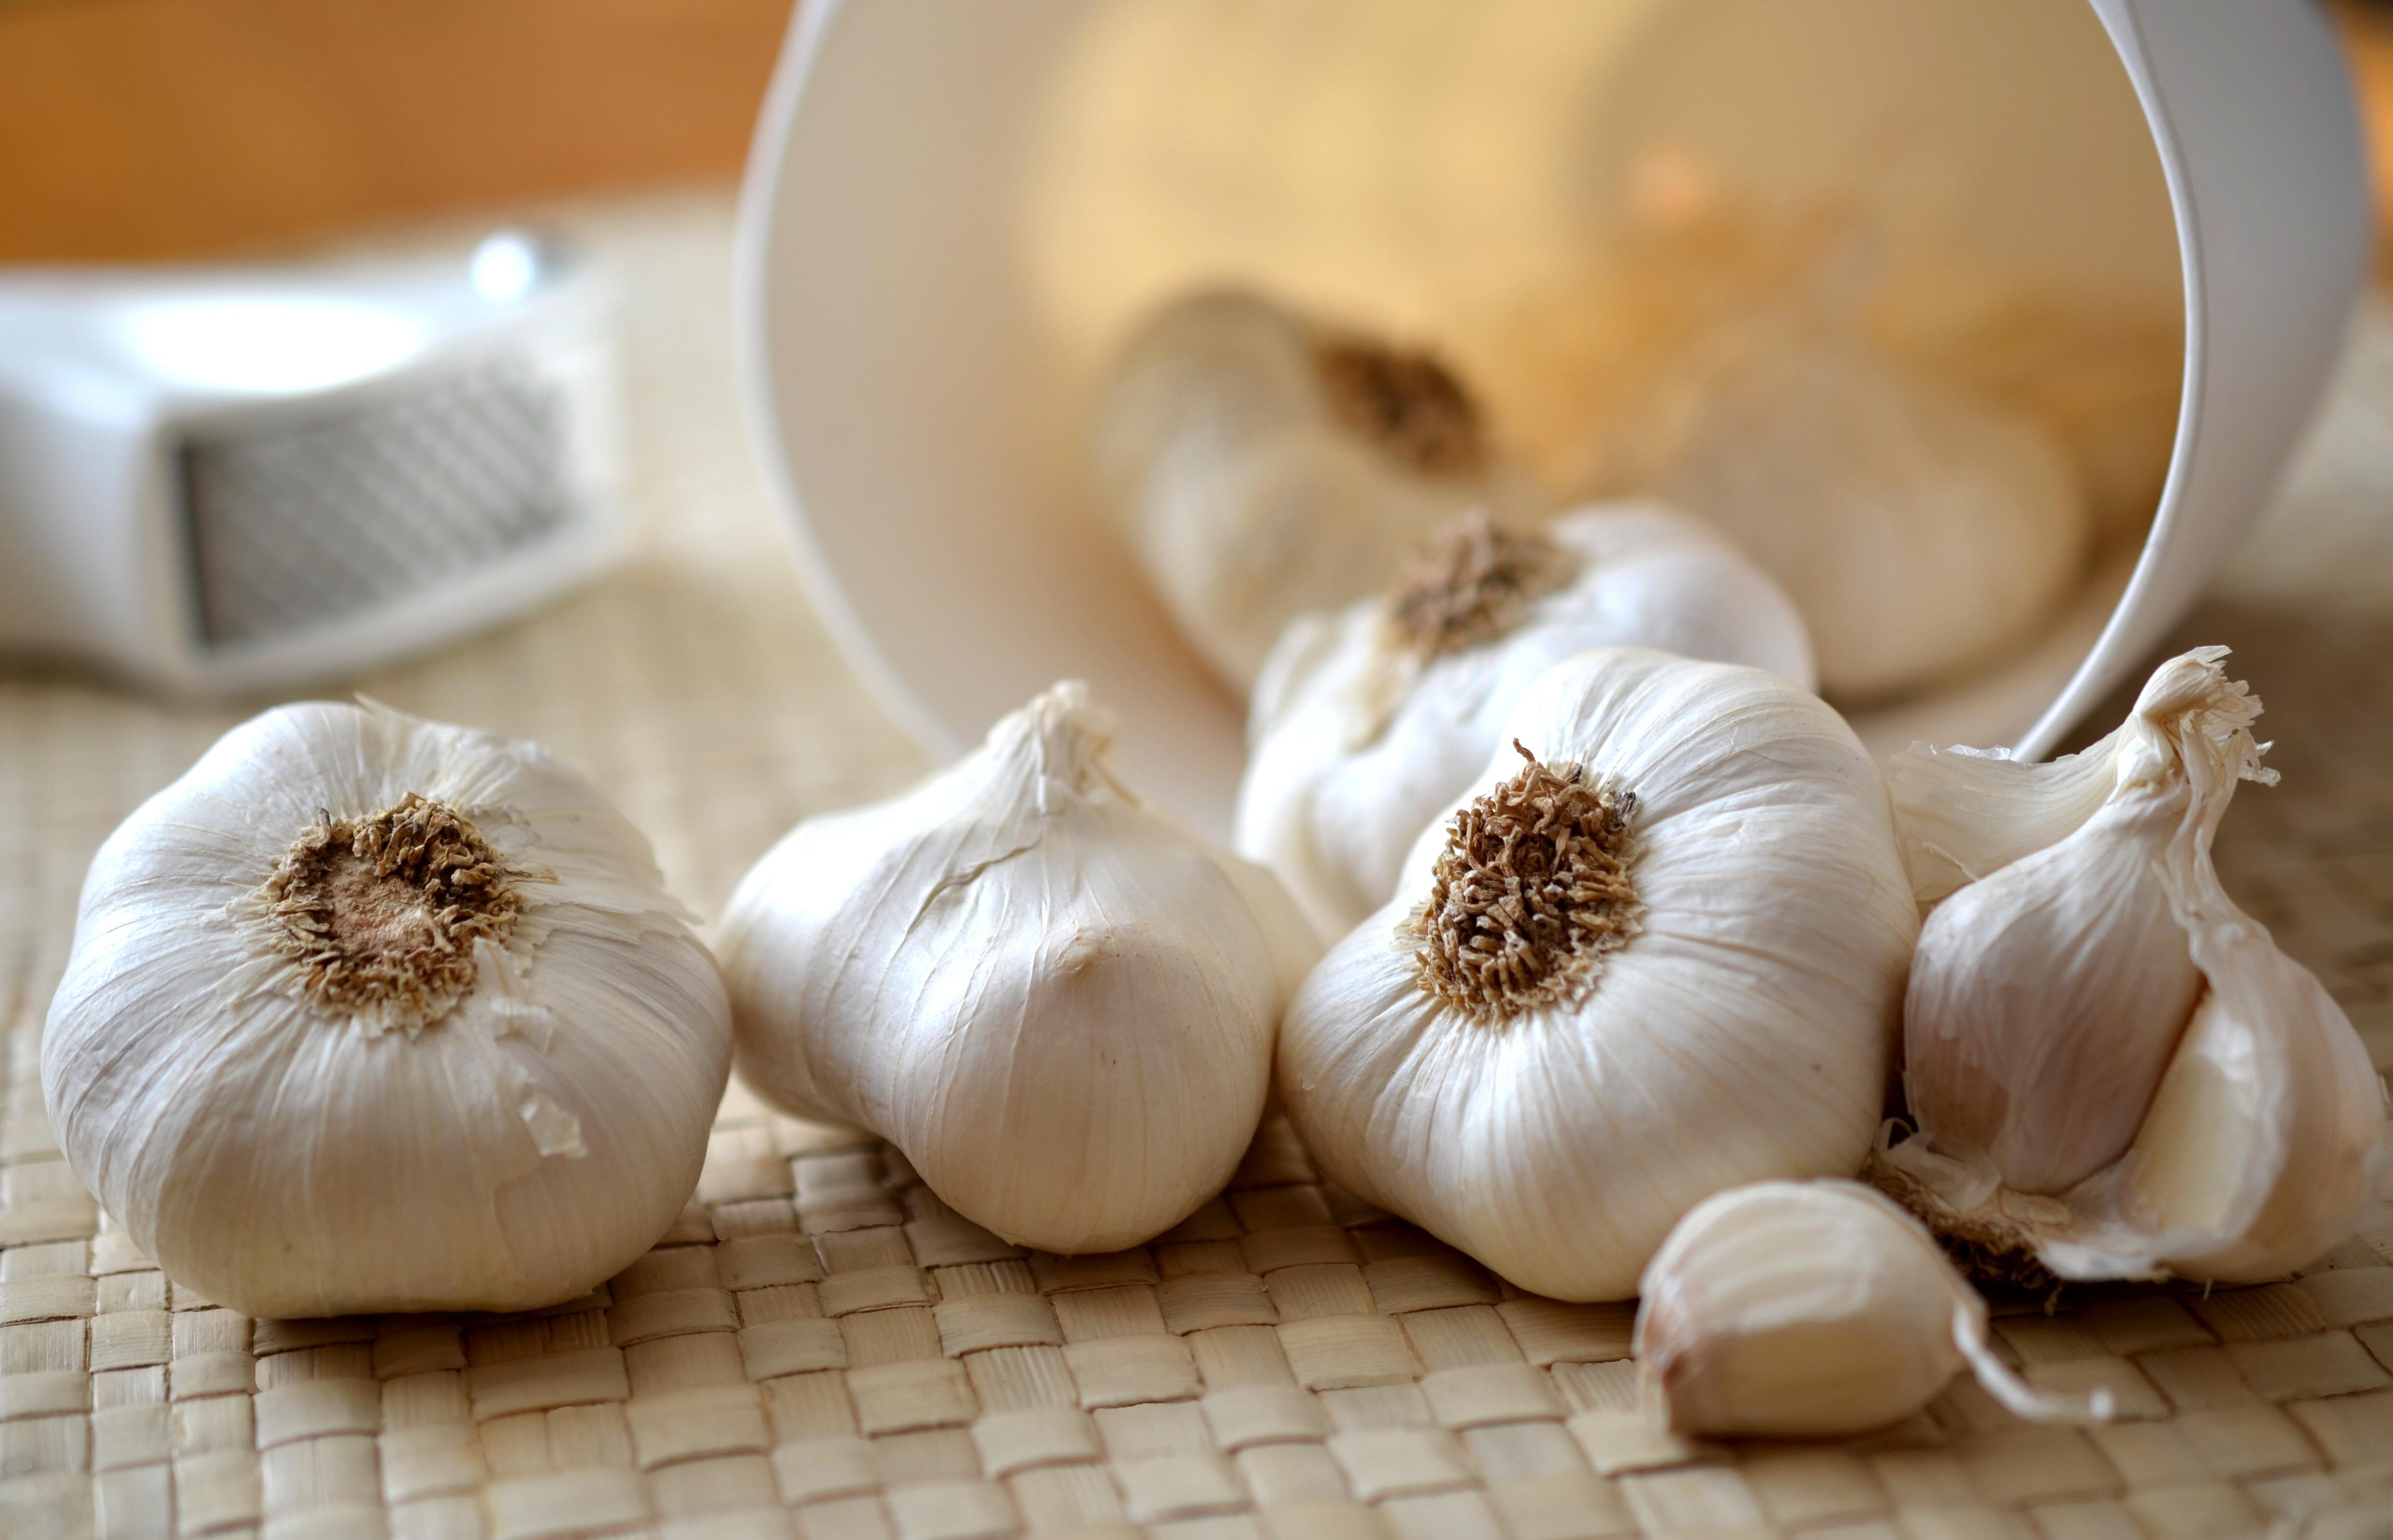 bawang putih bisa turunkan kolesterol - eskayvie indonesia